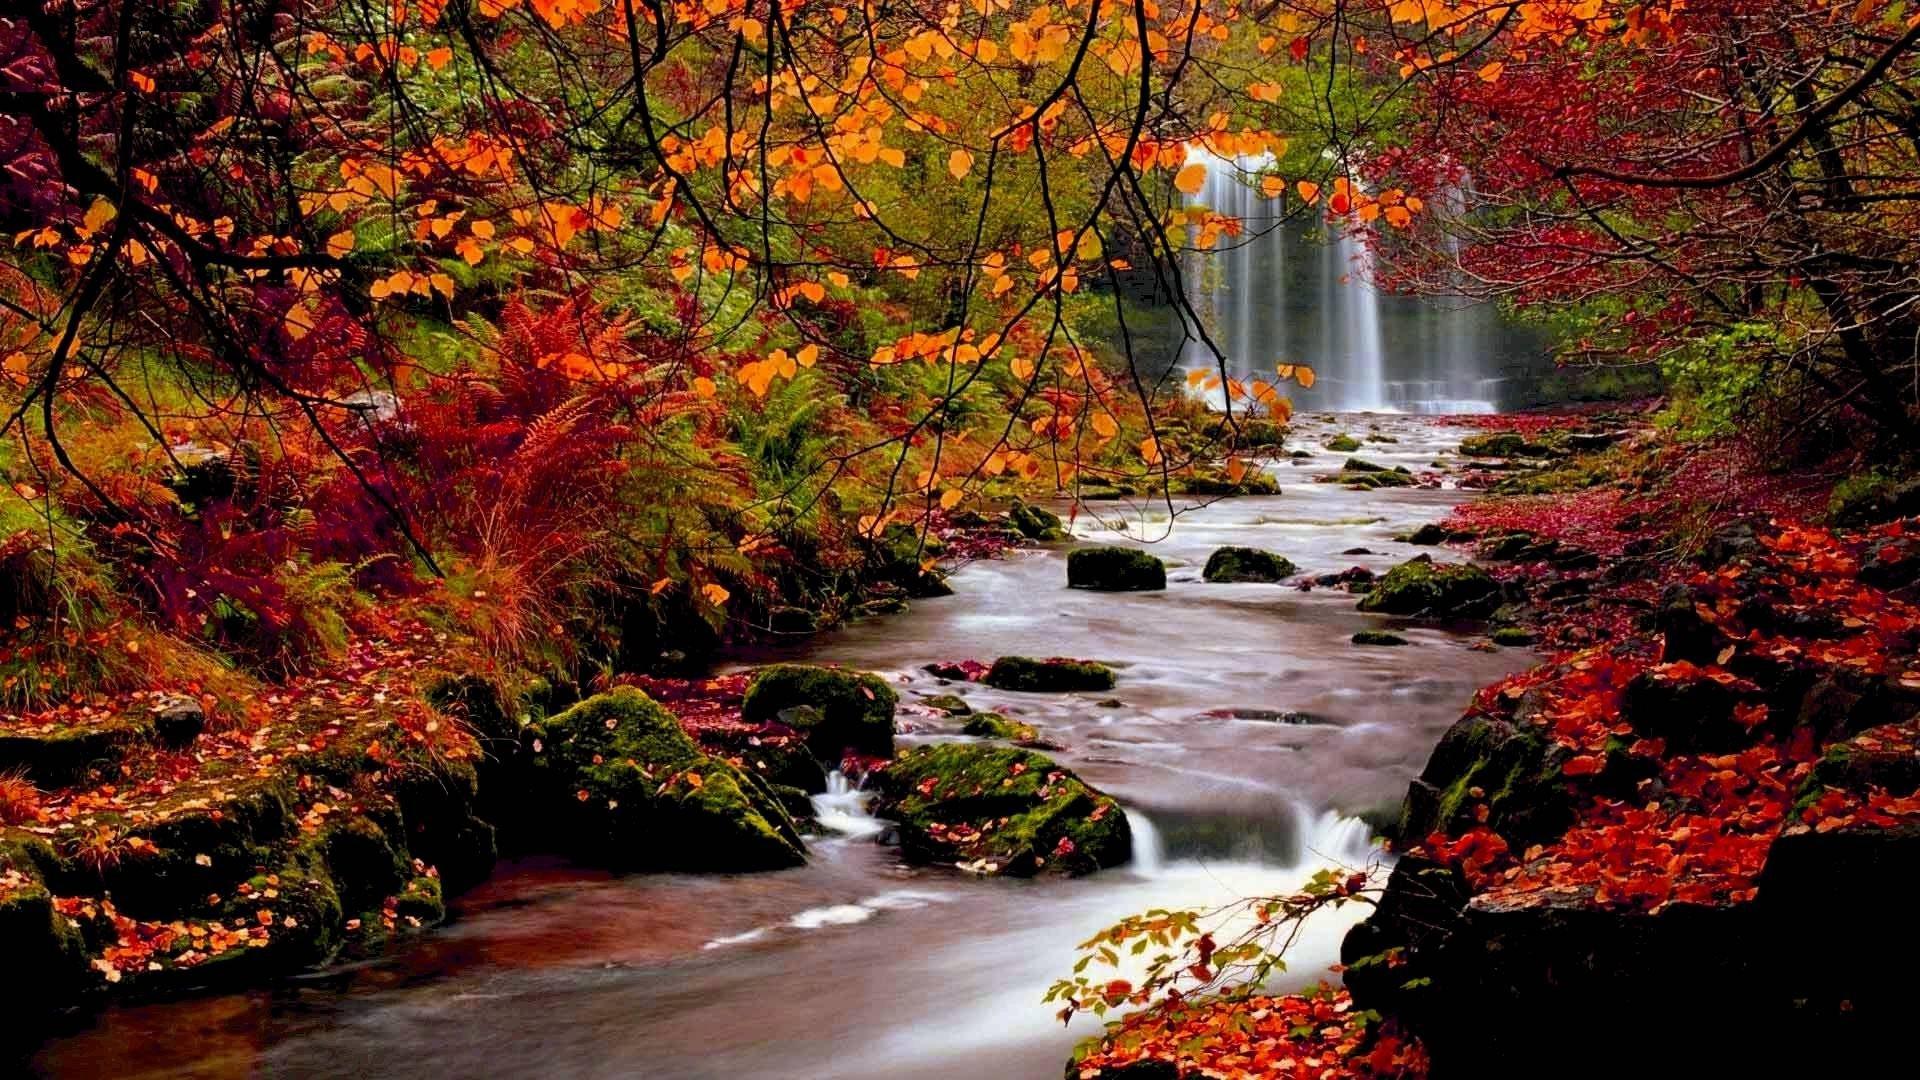 beautiful fall scenery wallpaper 49 images